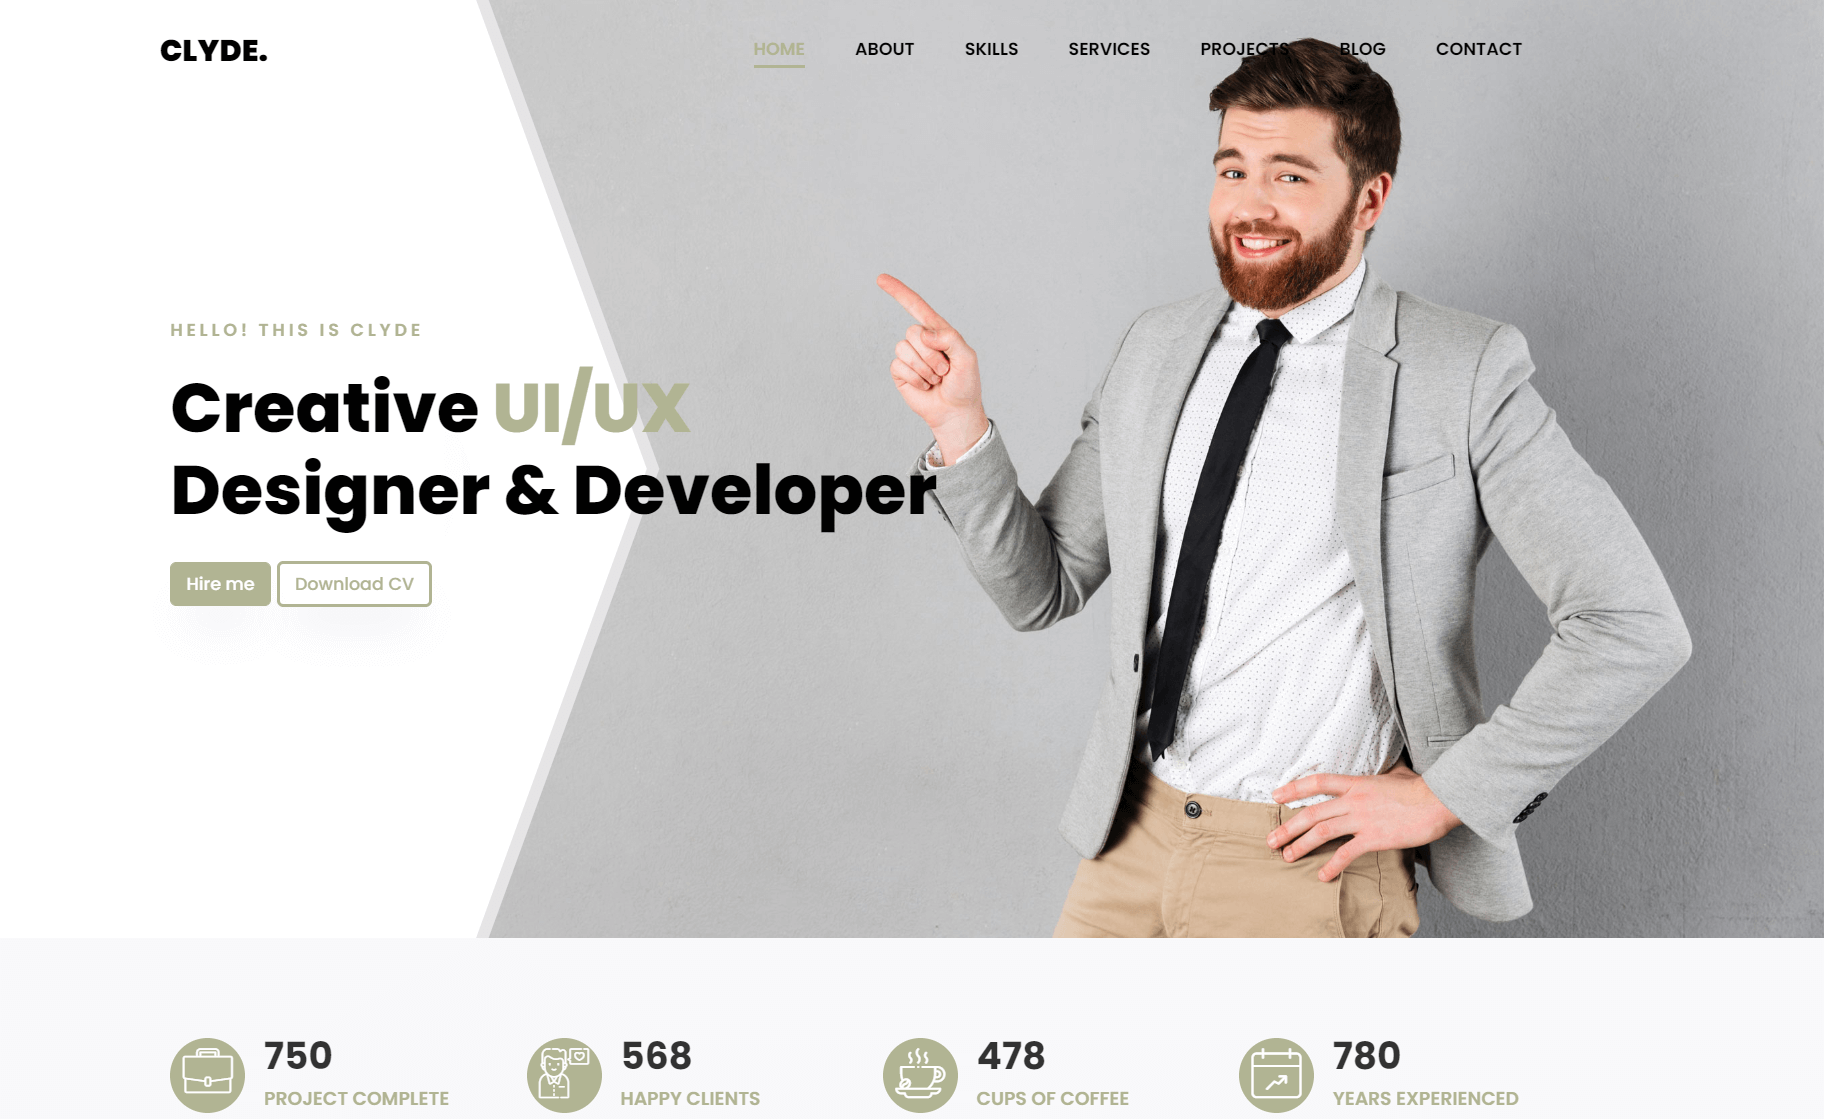 Free Bootstrap 4 HTML5 Responsive Portfolio Website Template